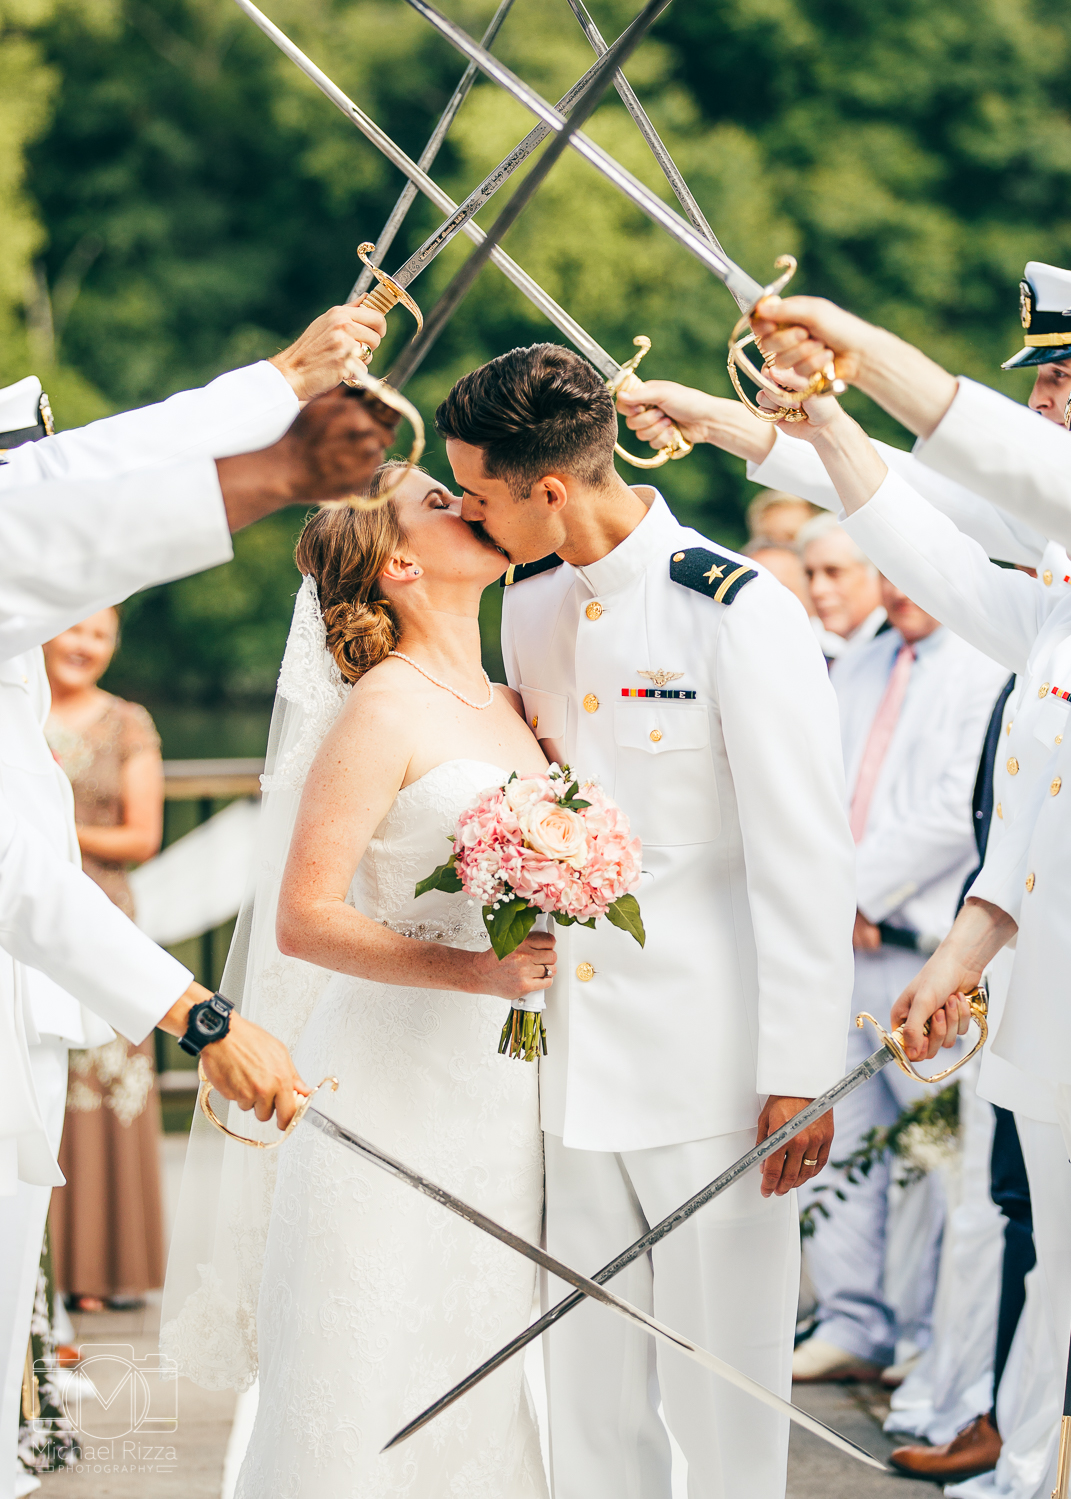 Densmore farm wedding | Chattanooga wedding photographer